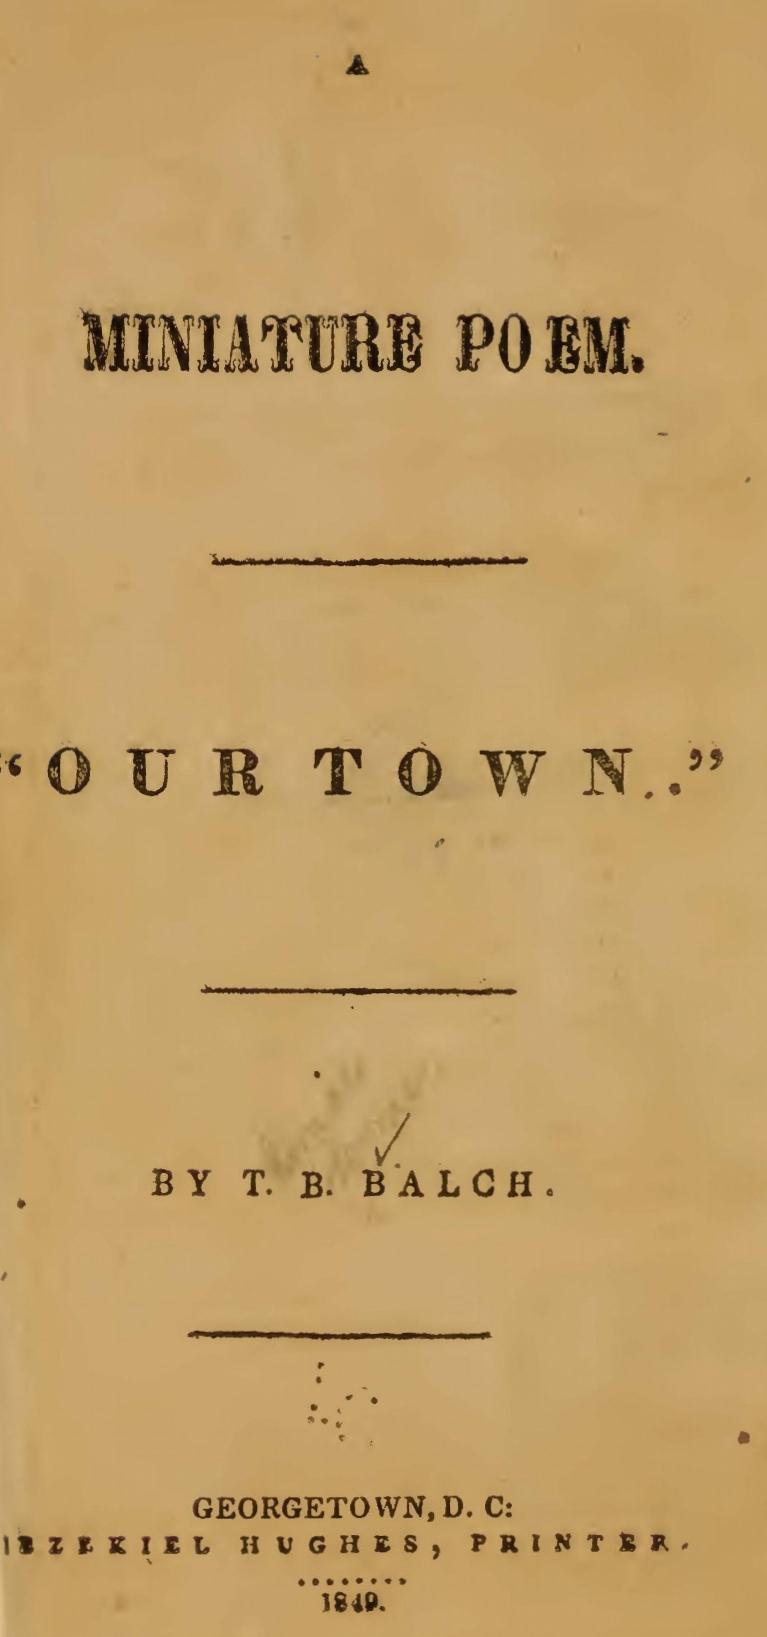 Balch, Thomas Bloomer, A Miniature Poem Title Page.jpg